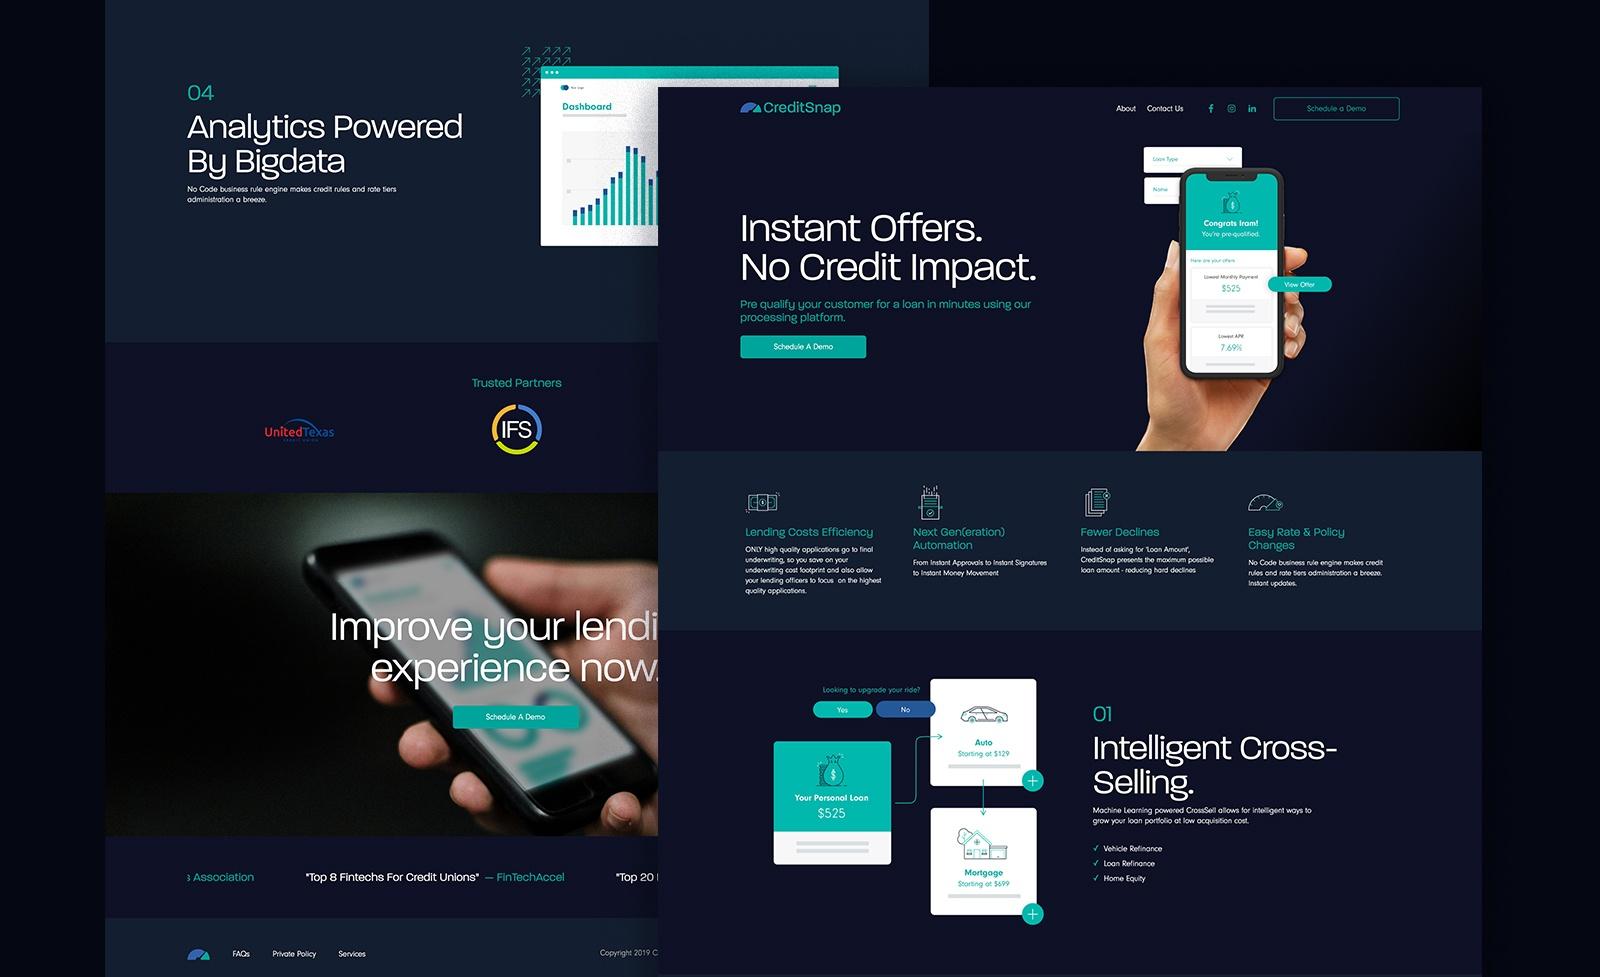 Overlap of CreditSnap designs